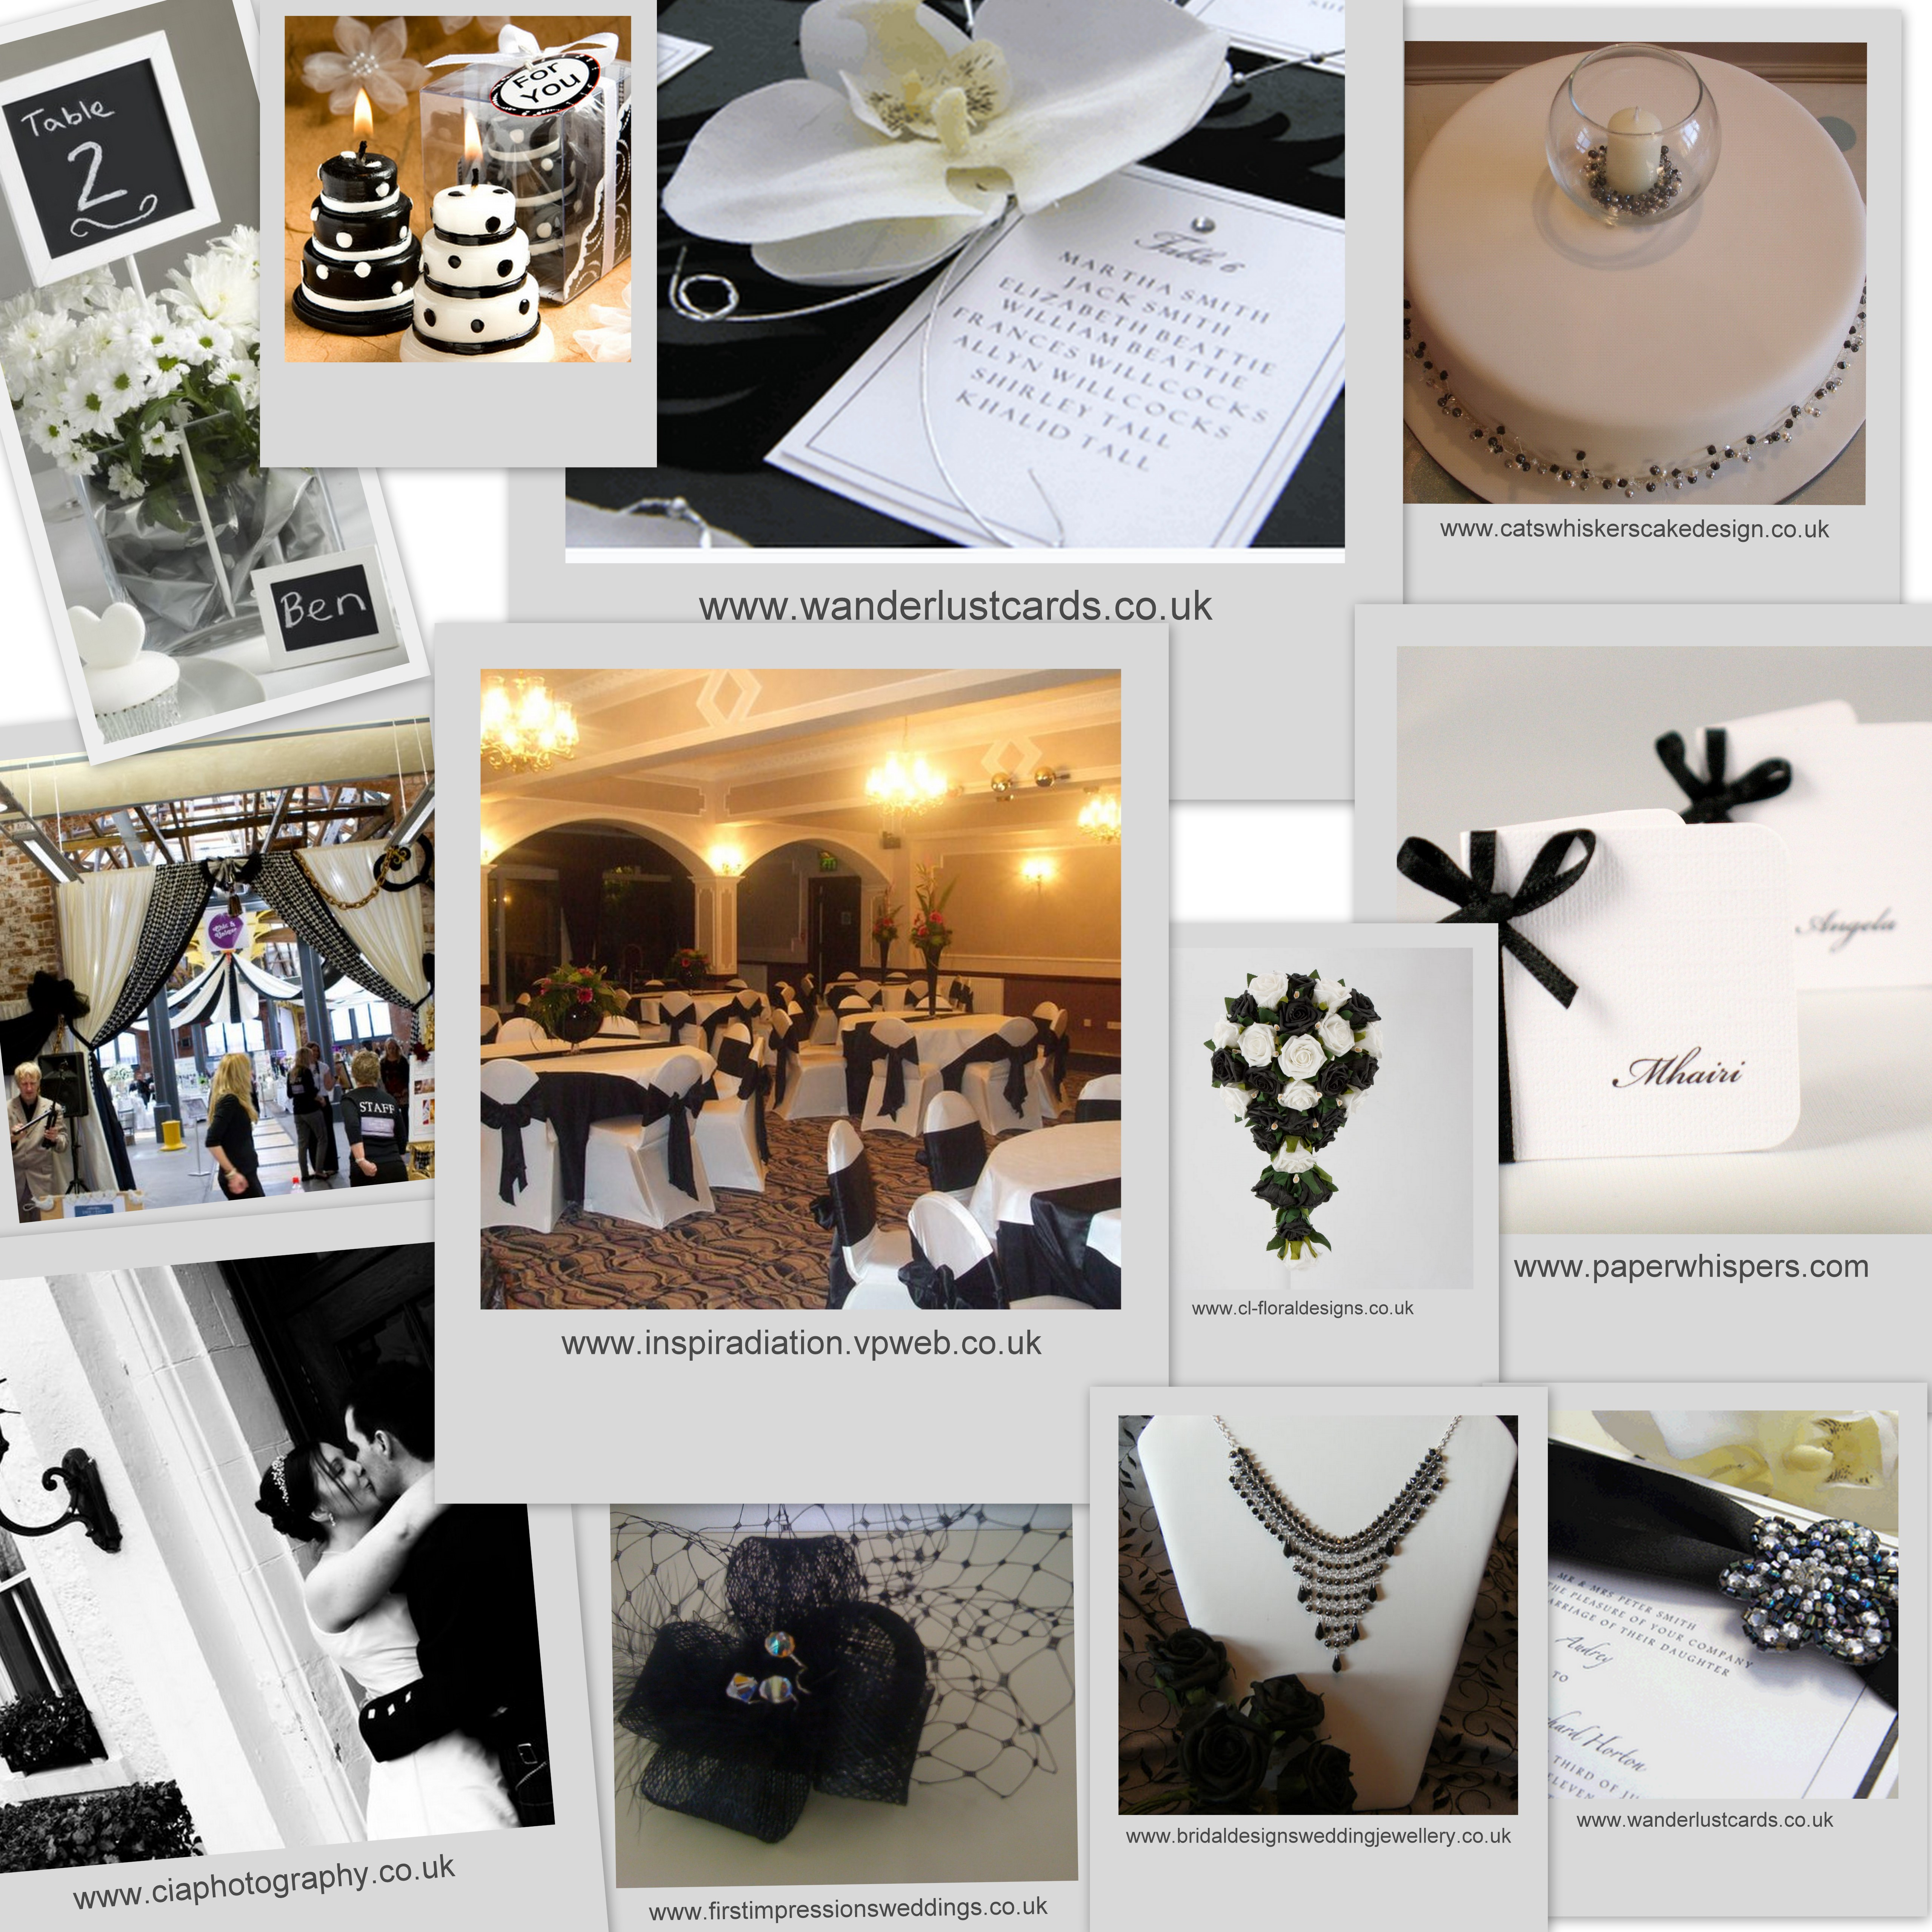 Black White Wedding Theme: Ideas For A Black And White Themed Wedding